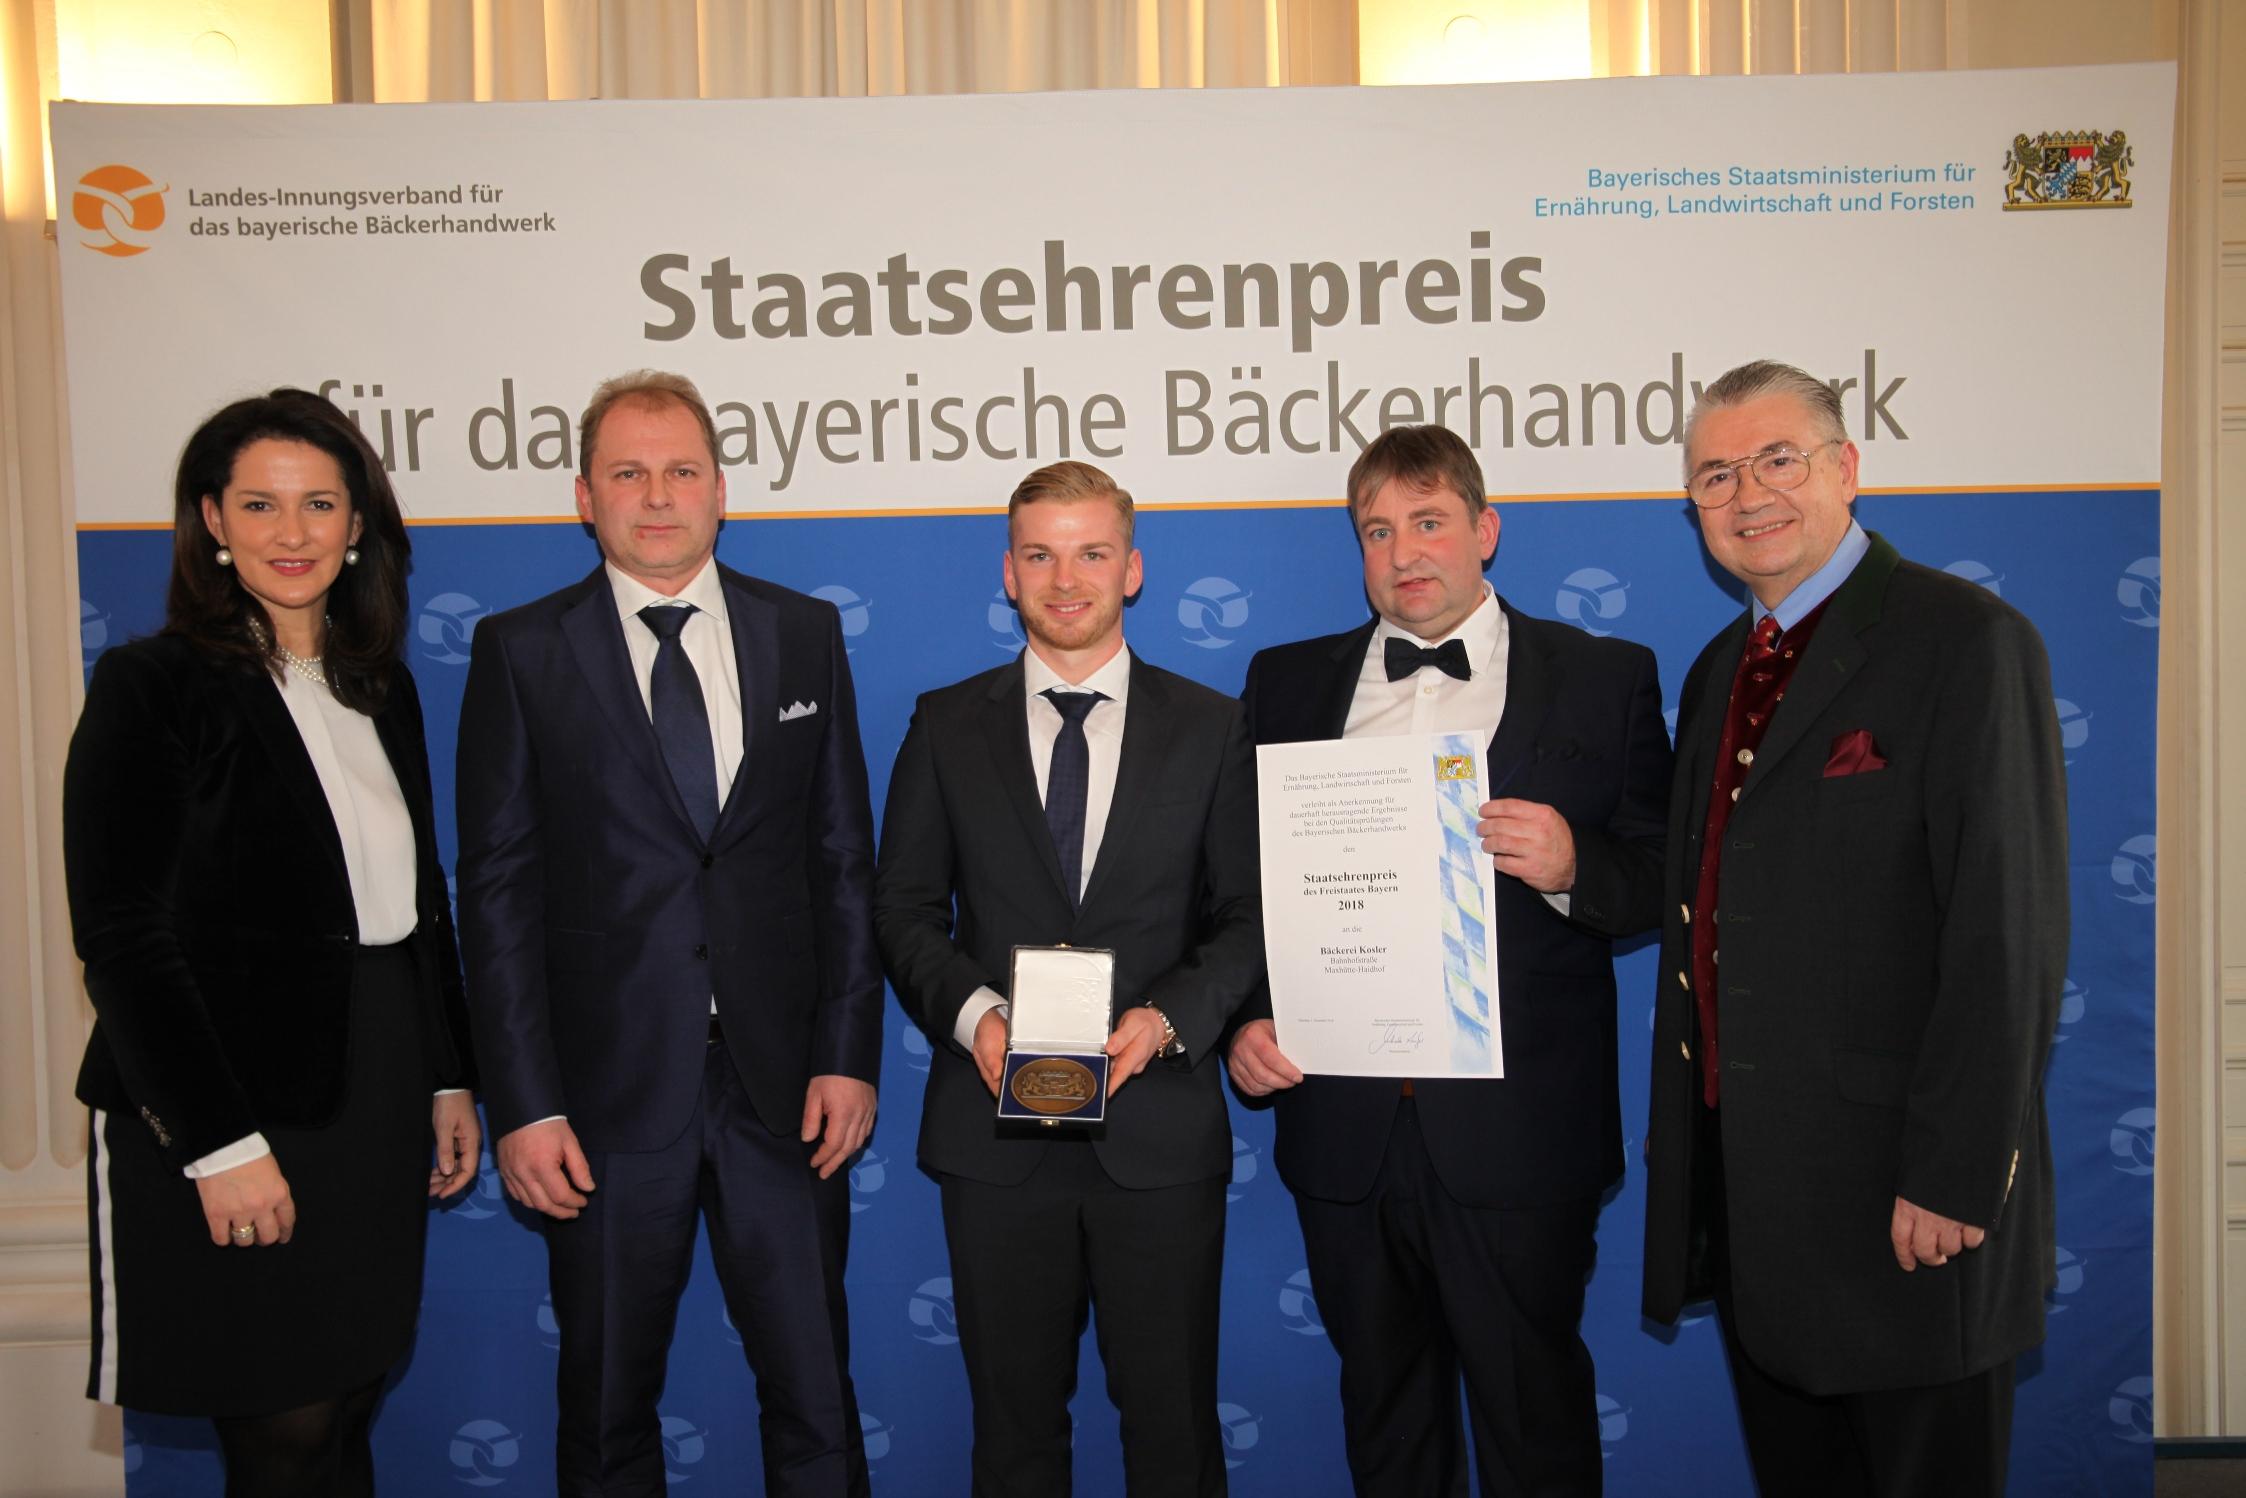 Staatsehrenpreis_Kosler_03122018_1